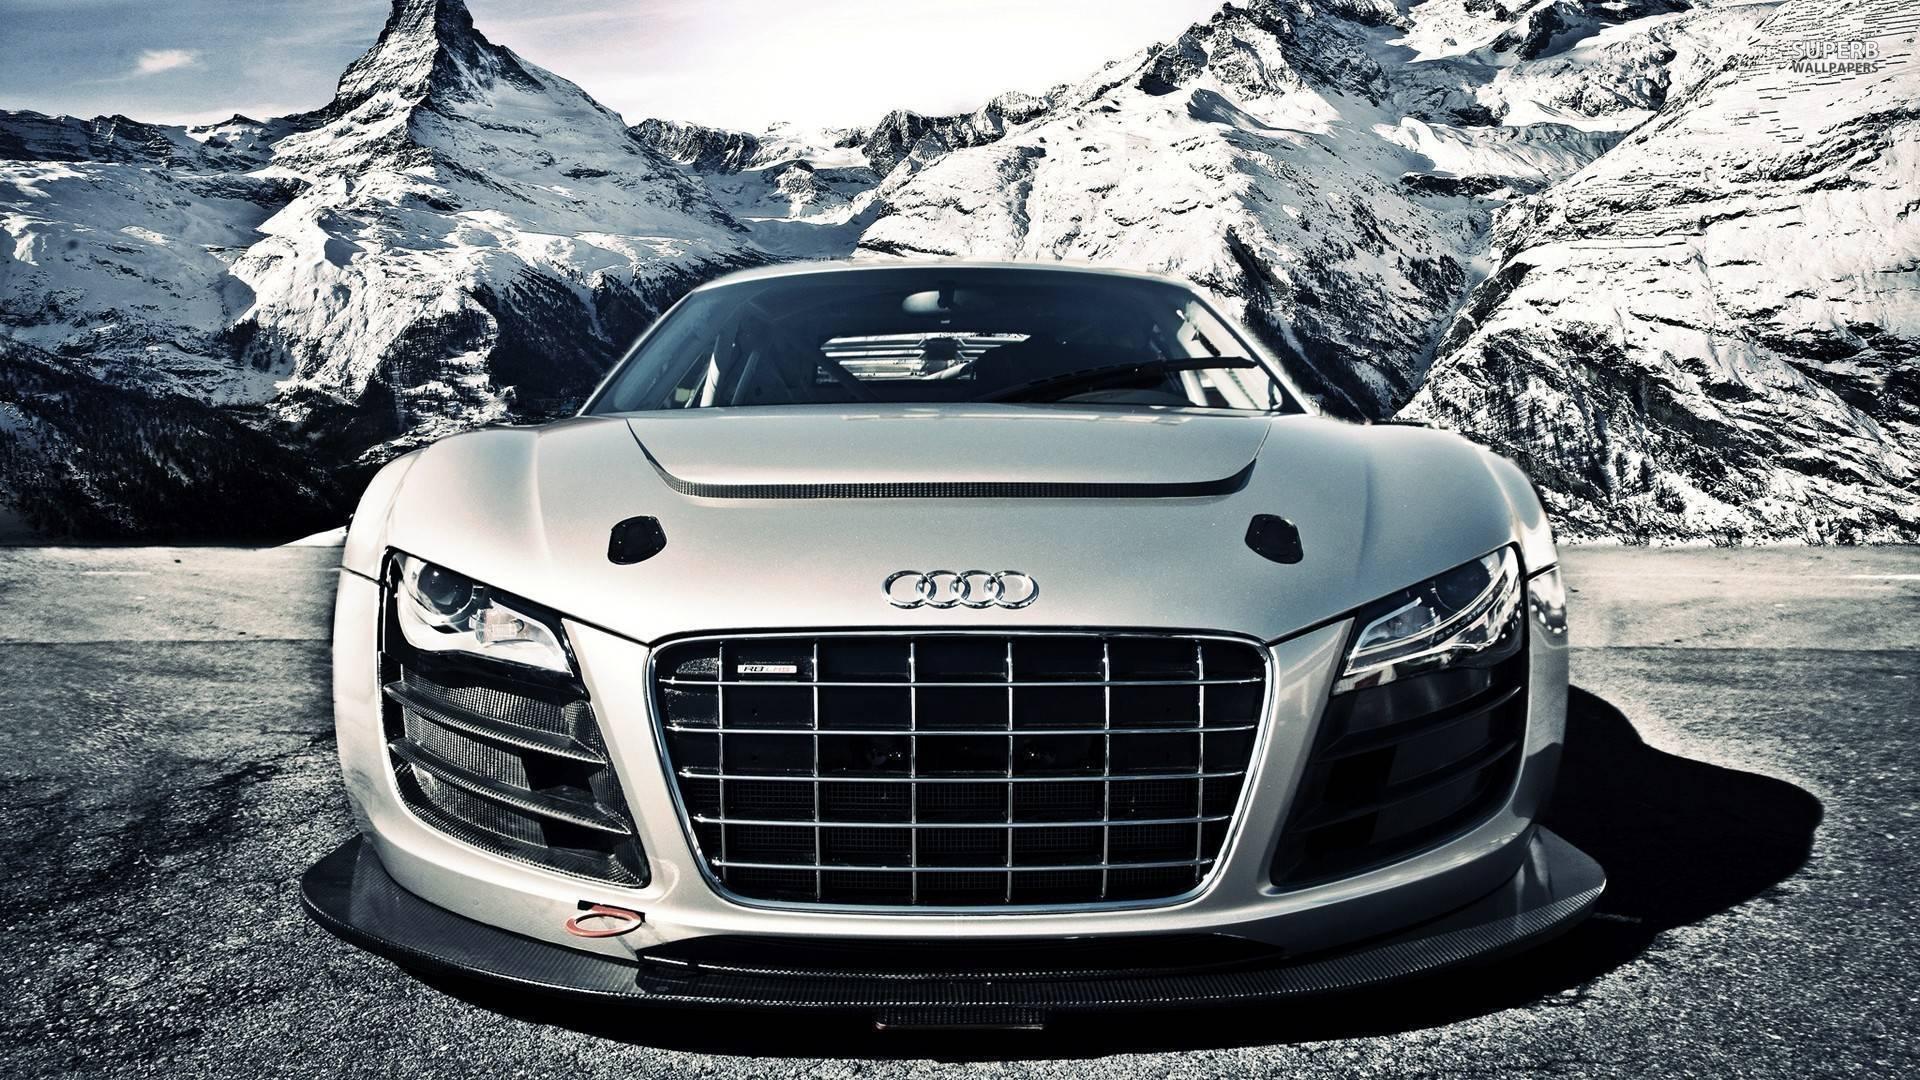 Audi 4k Wallpapers Top Free Audi 4k Backgrounds